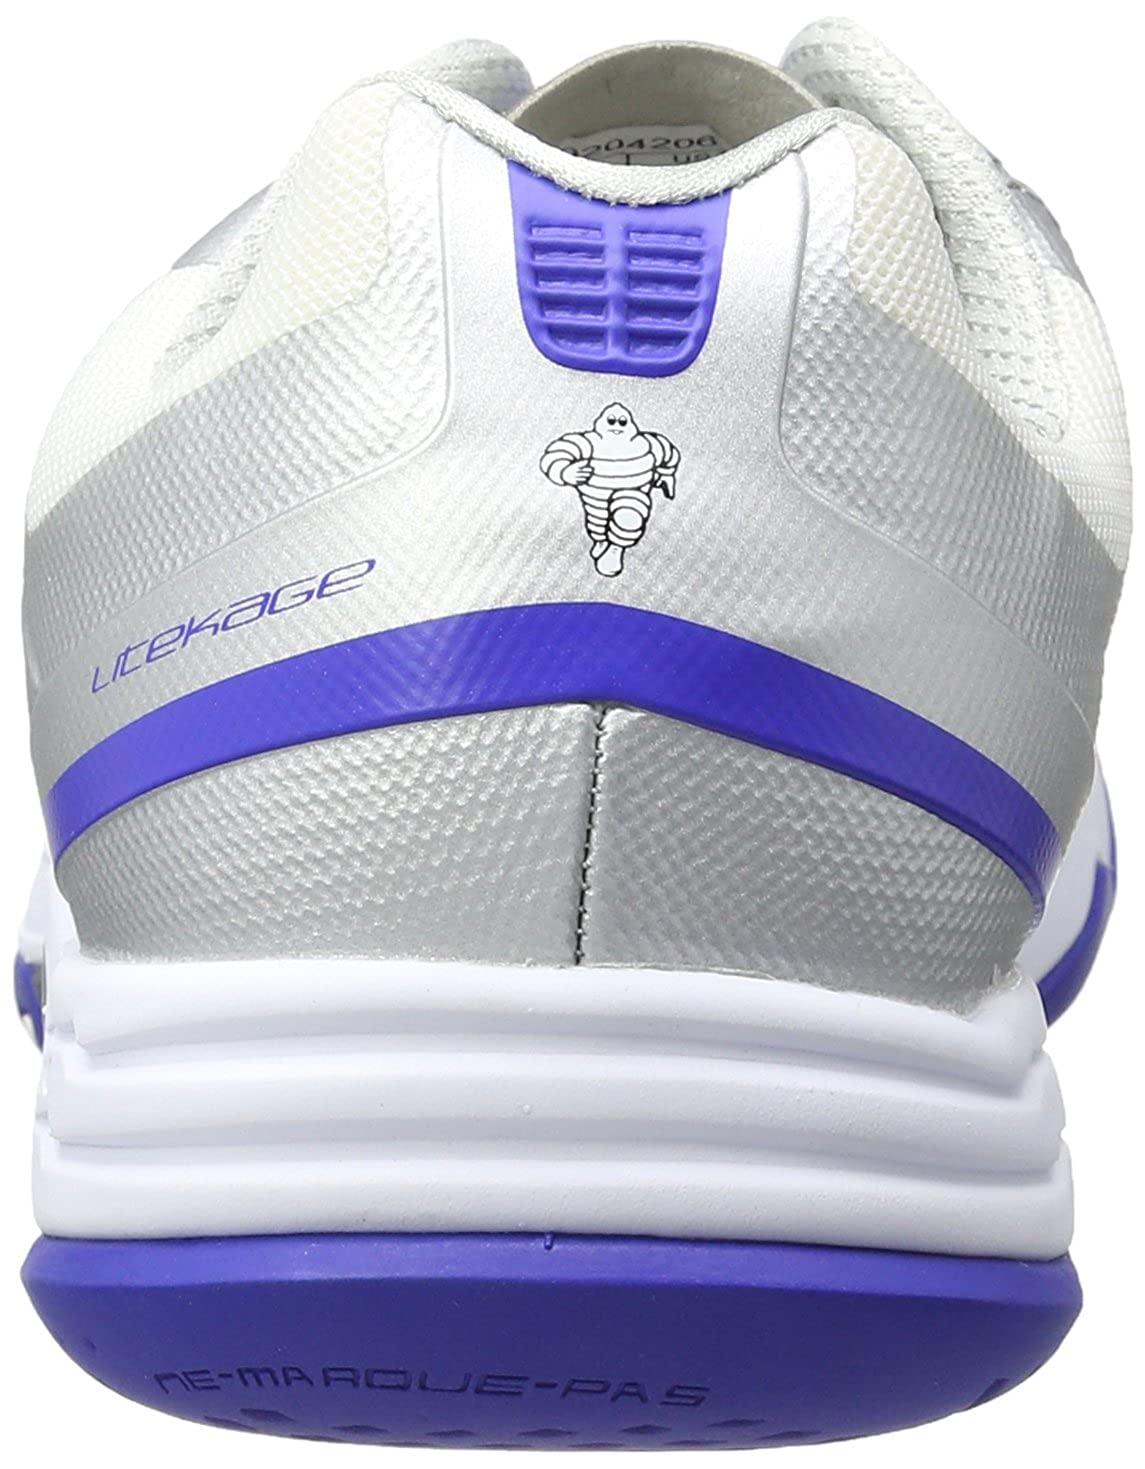 FanSport24 FanSport24 FanSport24 Unisex-Erwachsene Fly High Wing Lite Handballschuhe 744c33